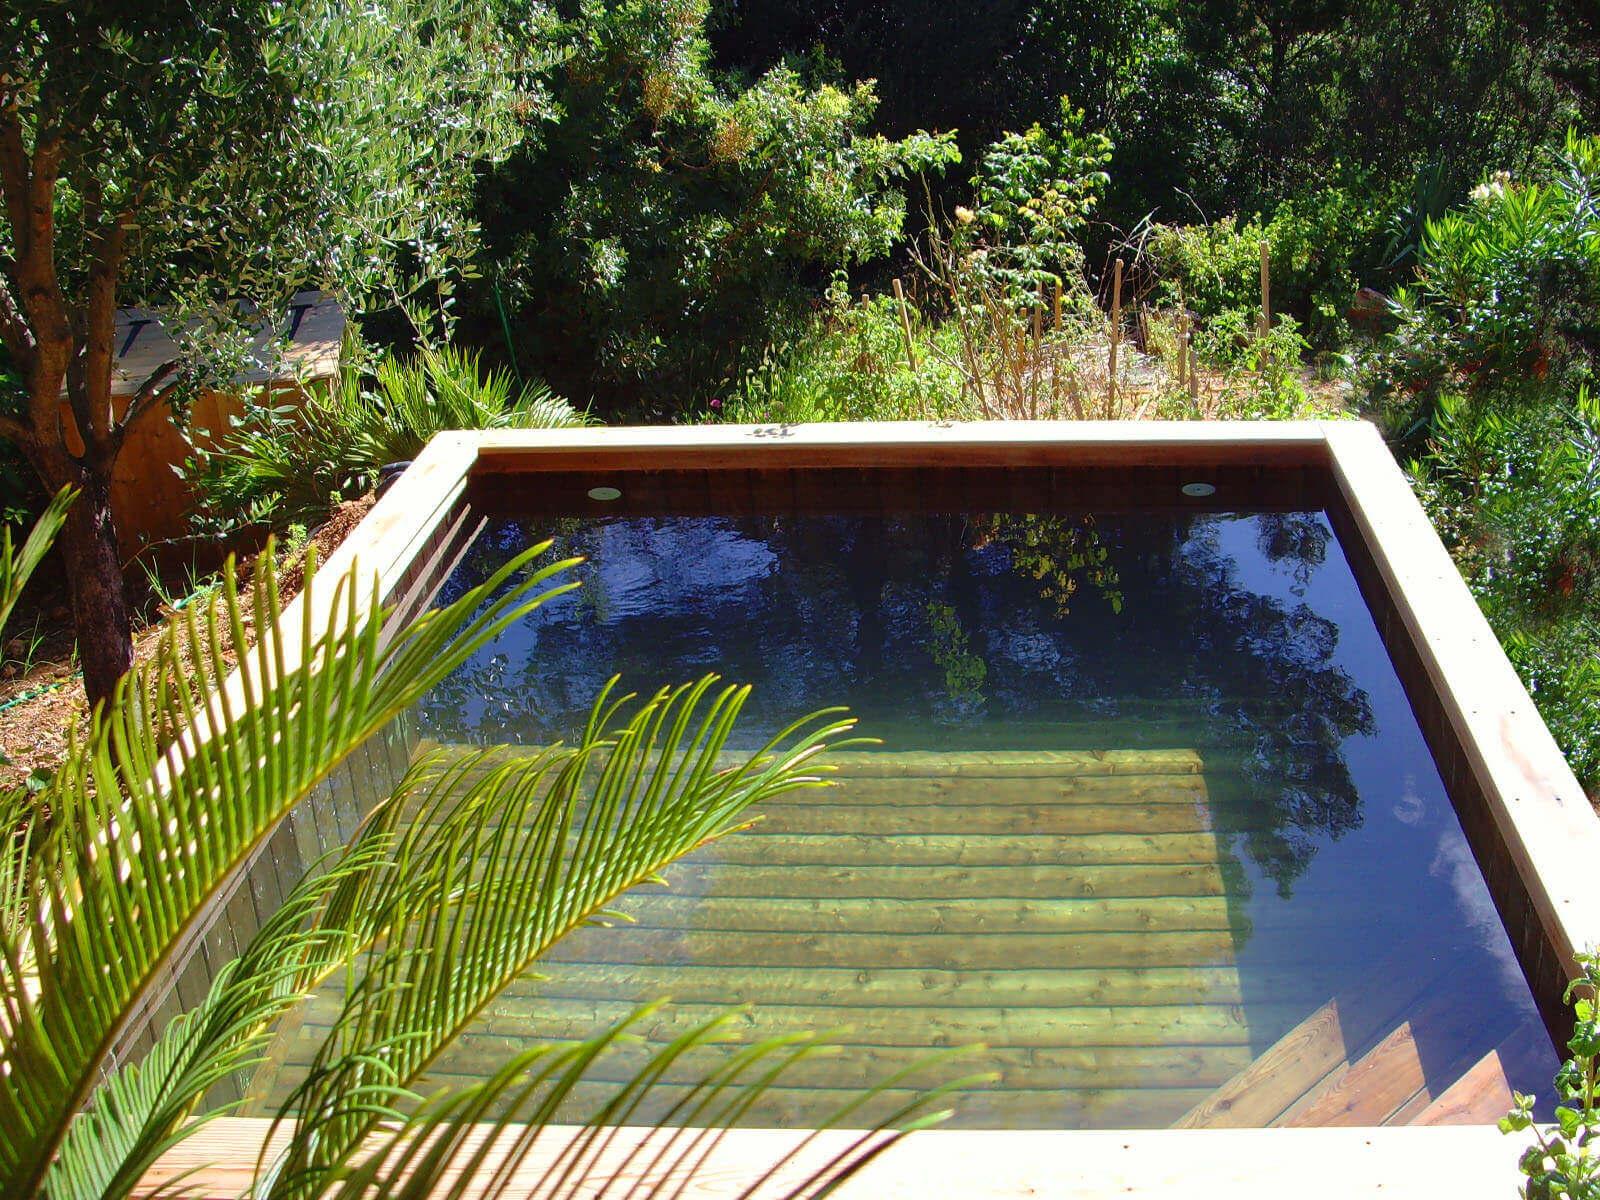 Piscine petite taille piscine de petite taille piscine xs for Piscine coque petite taille